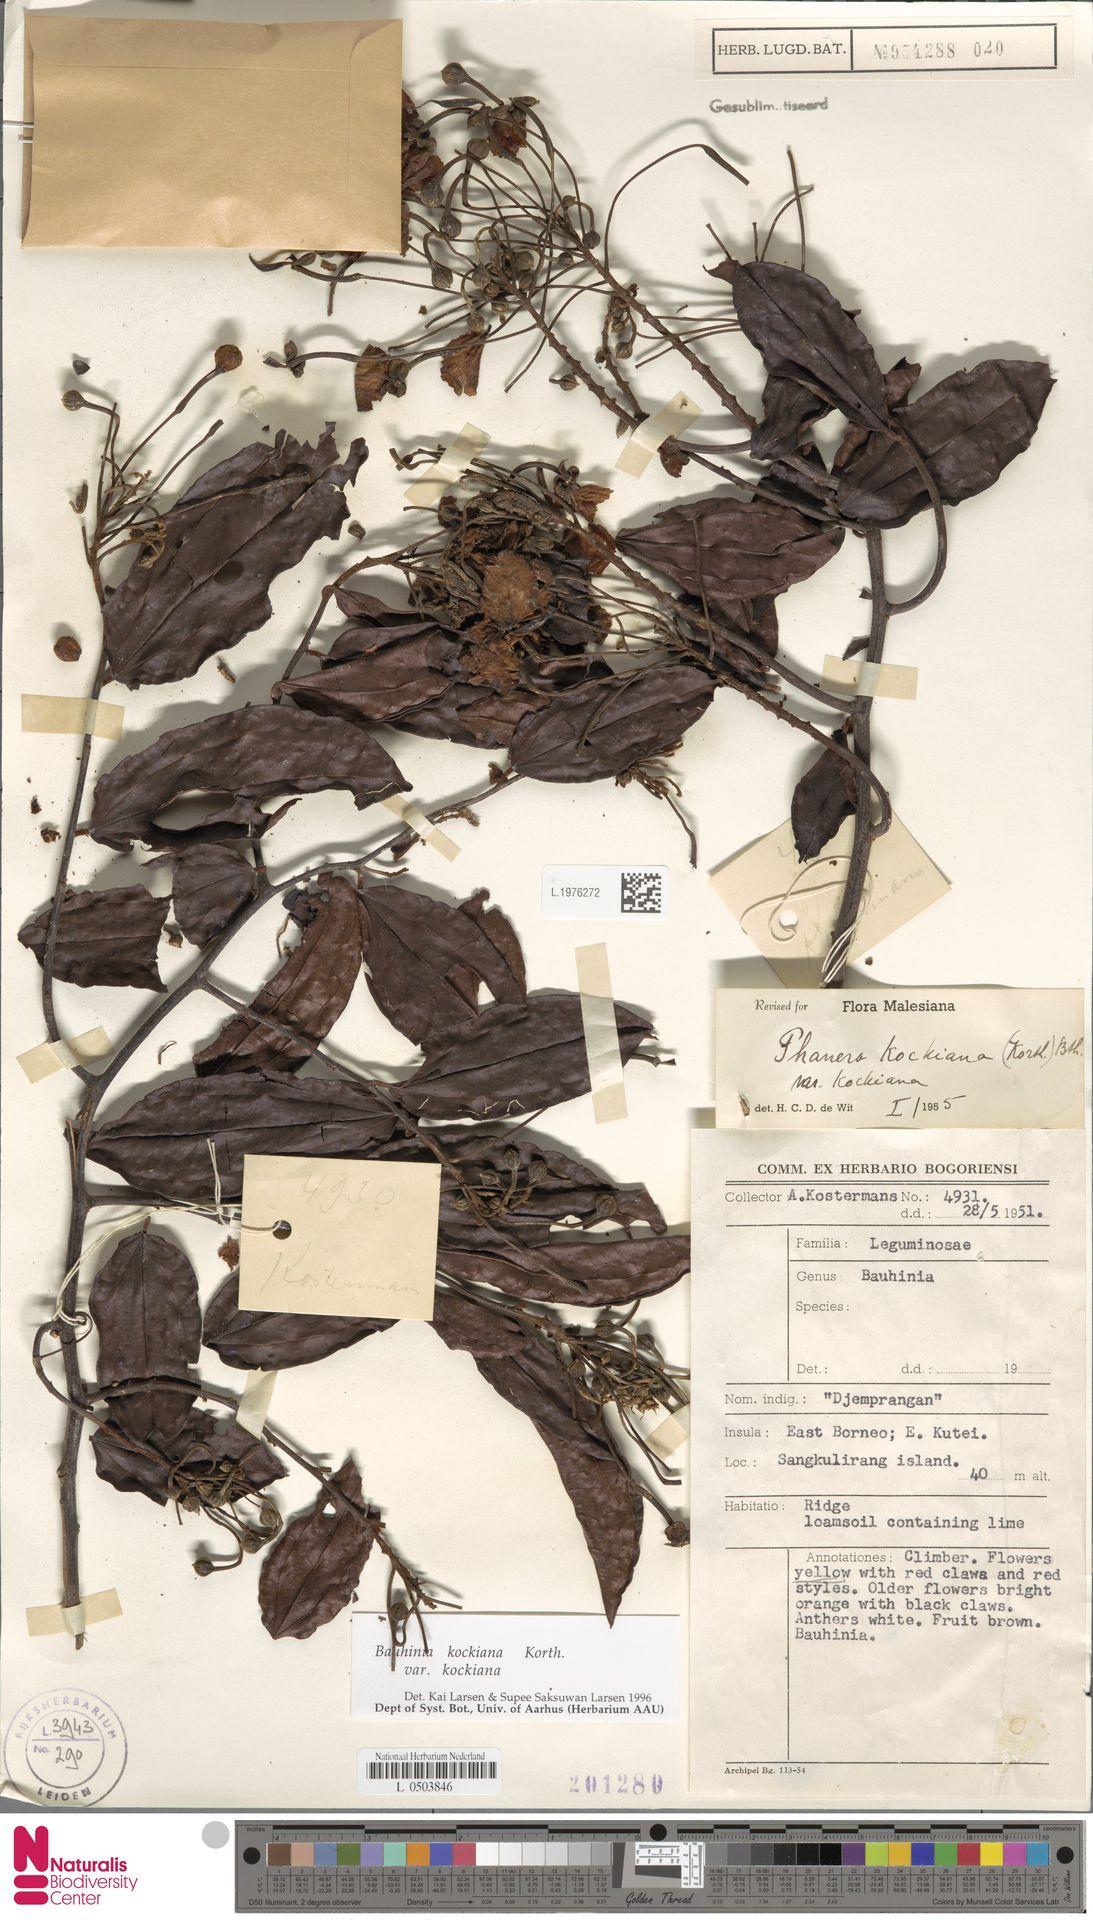 L.1976272 | Bauhinia kockiana var. kockiana